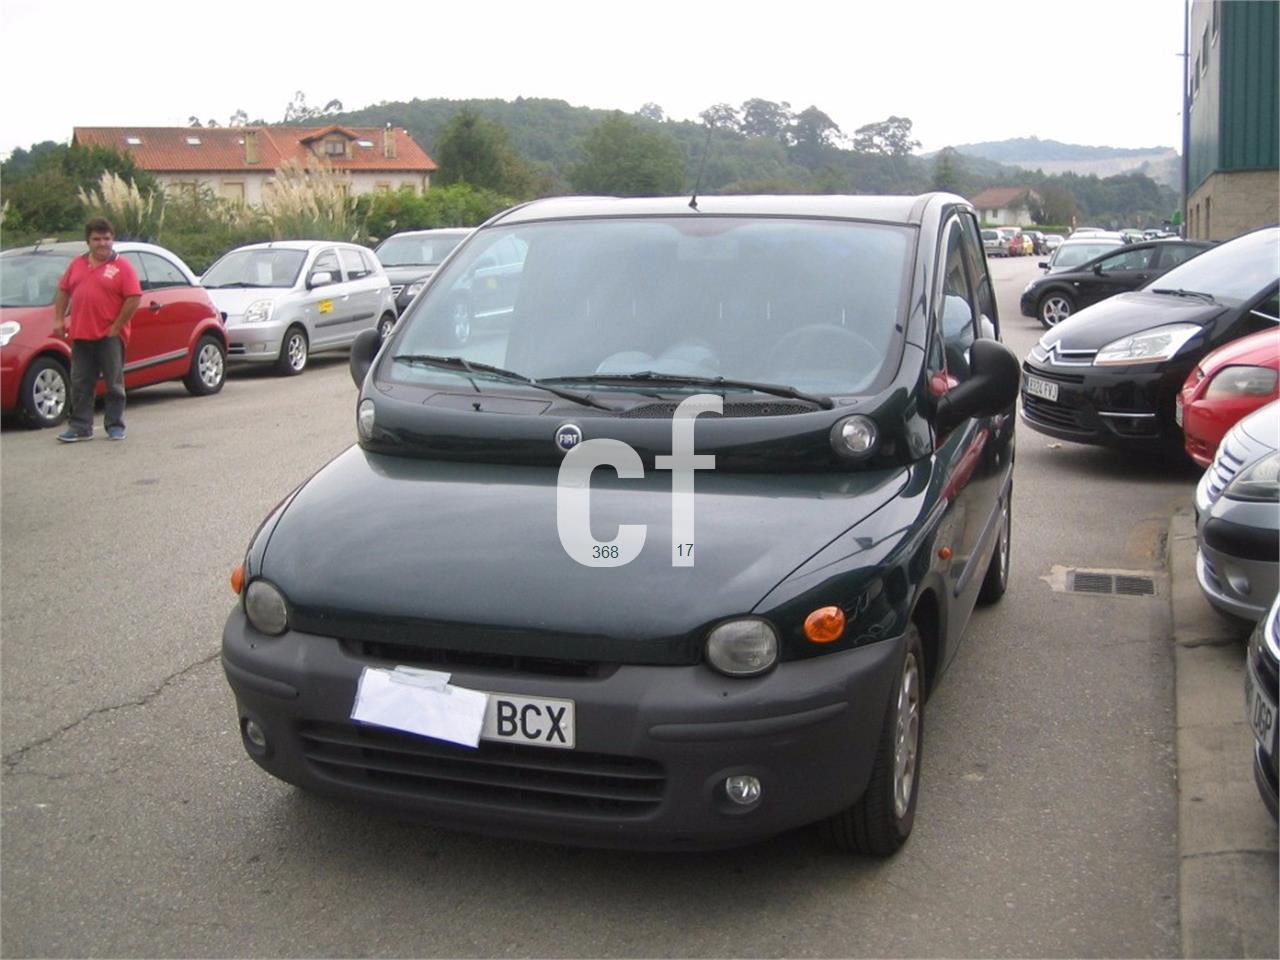 fiat multipla la centrale with C Cda31d7114d38565111be56fba26355b7da01d6617f3854111 on Ponte Posteriore Fiat Multipla in addition Index further 3721 Fiat Fiat Multipla 2 Serie Kit Airbag in addition Fiat Multipla as well Modellini 1.